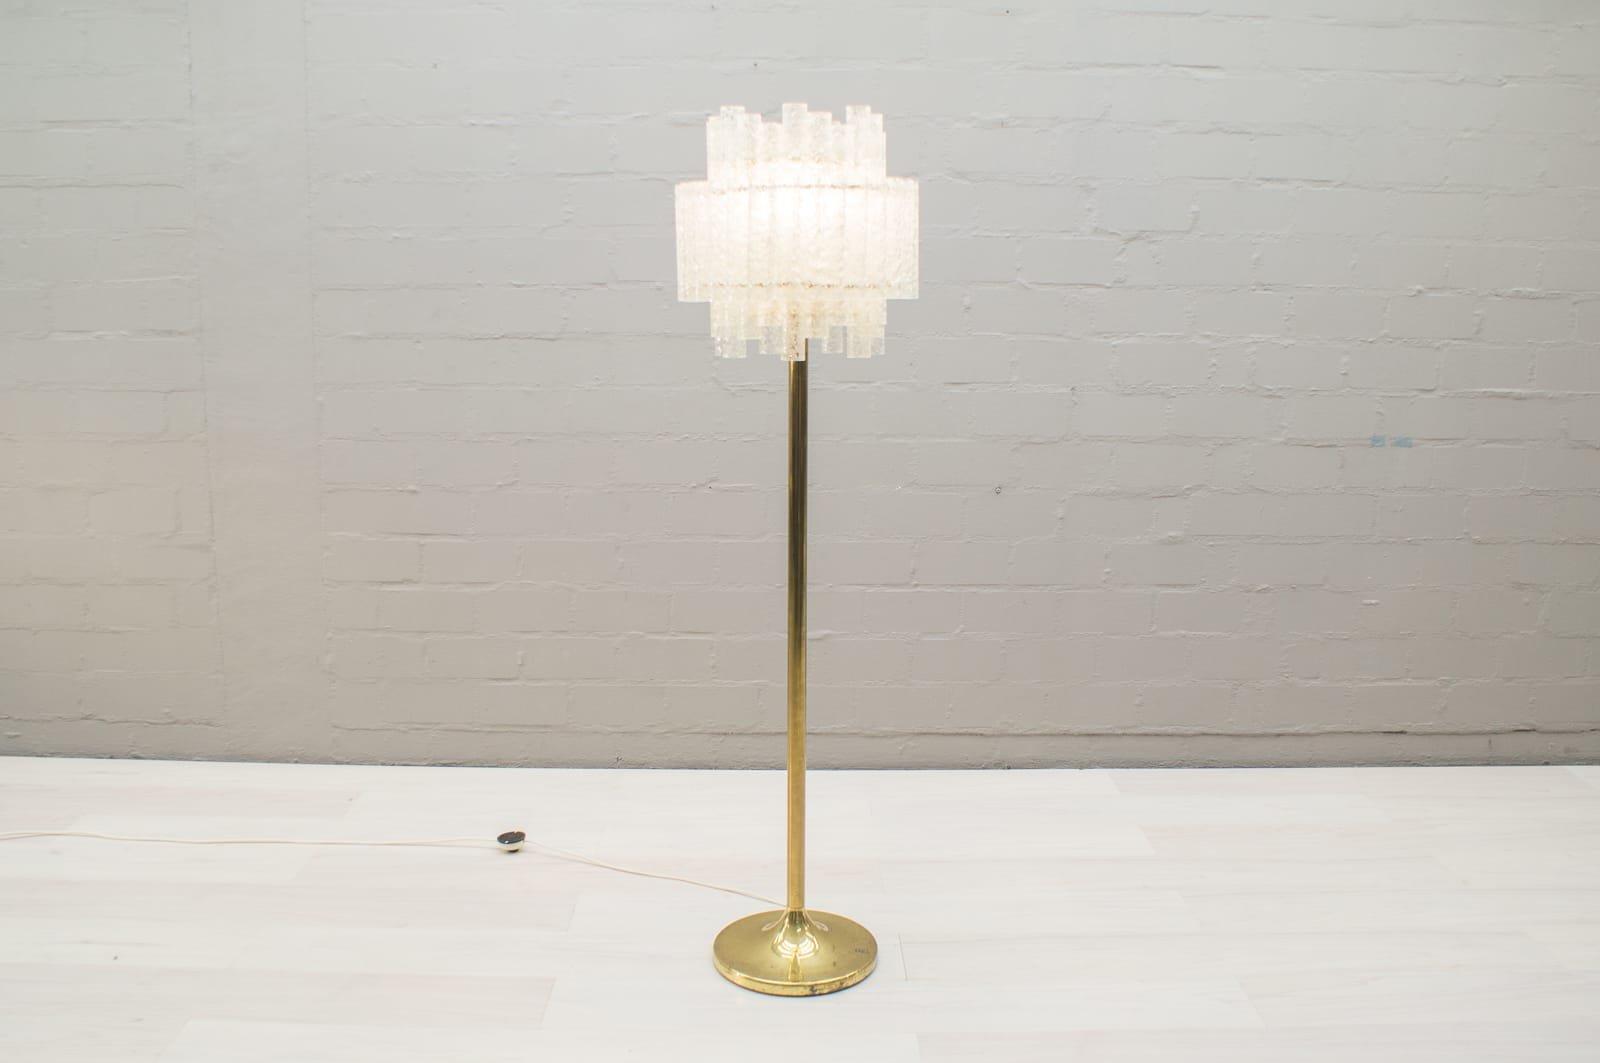 Lampada da terra in vetro e dorata di doria leuchten anni in